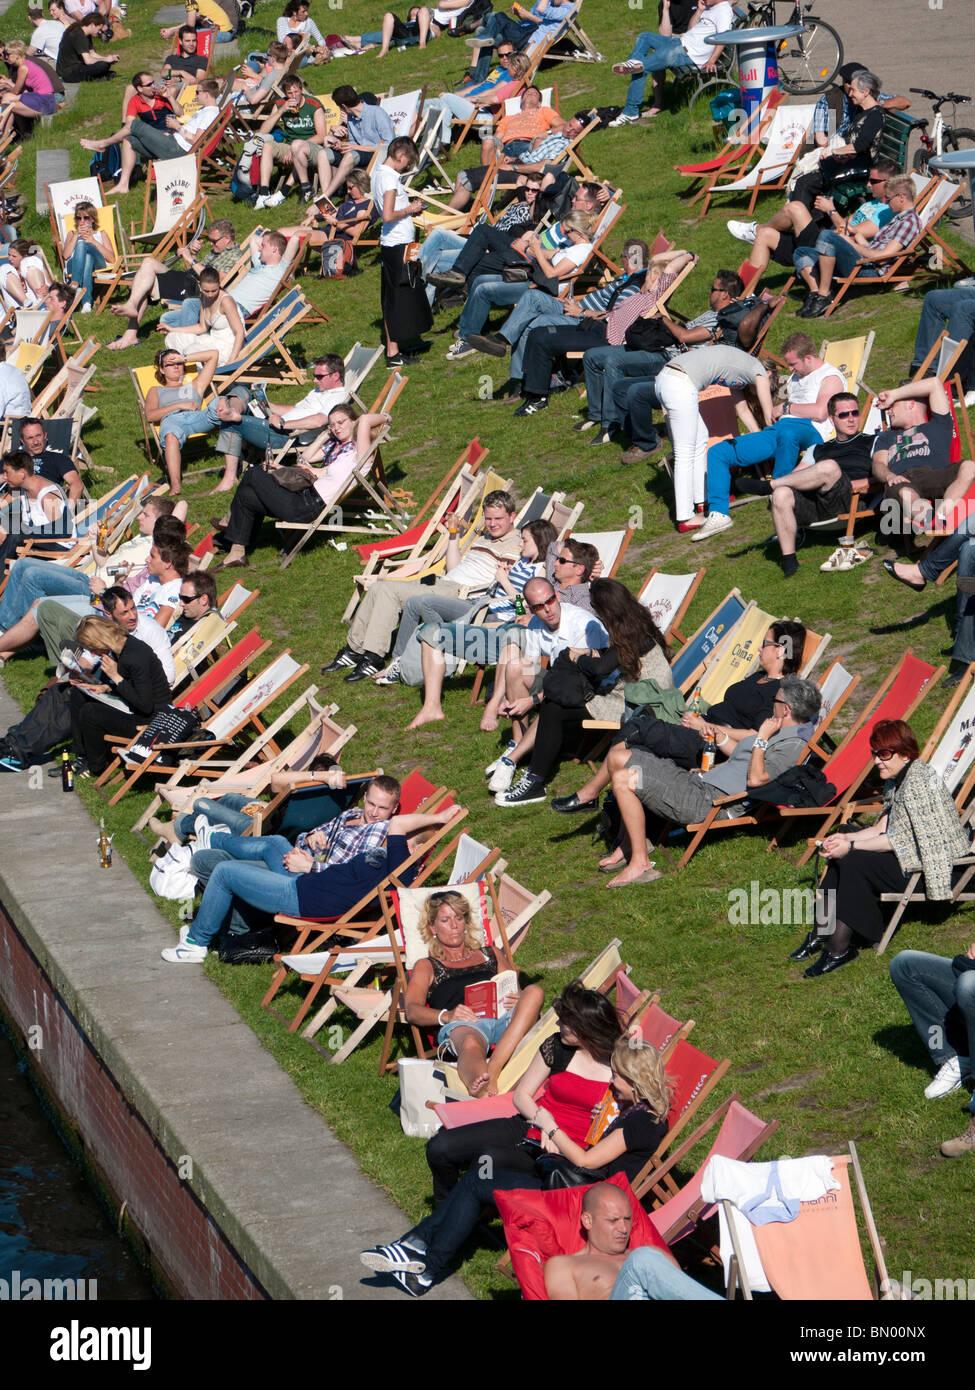 Busy waterside café in summer beside Spree River in central Mitte Berlin Germany - Stock Image